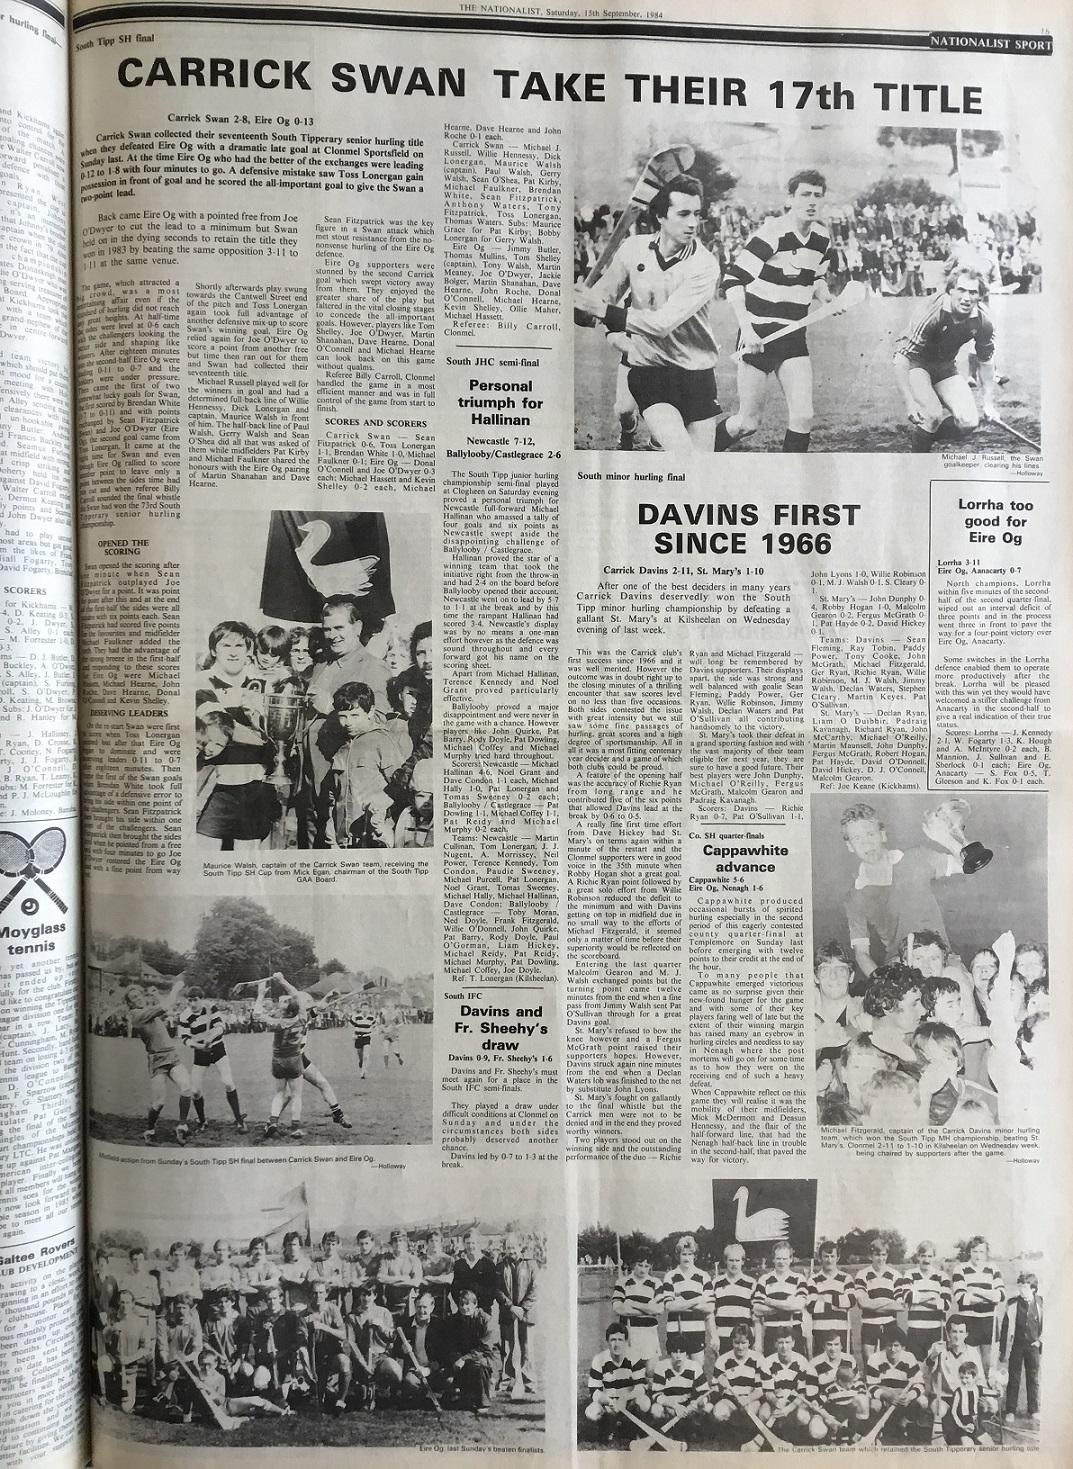 1984 South hurling final